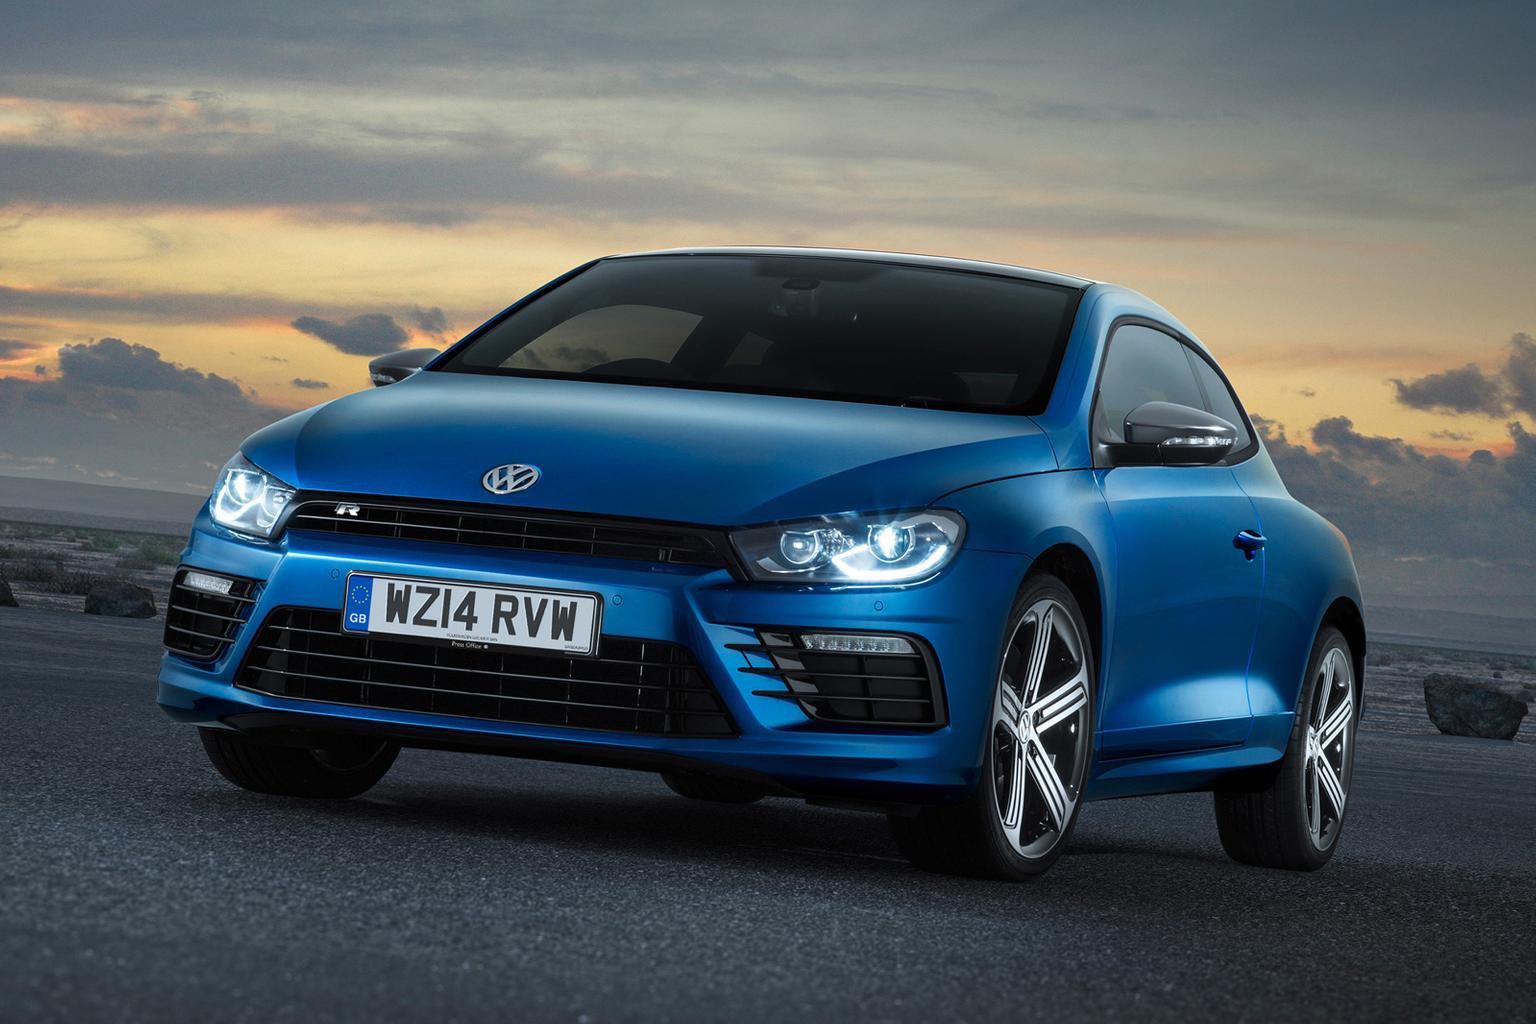 2014 Volkswagen Scirocco pricing revealed